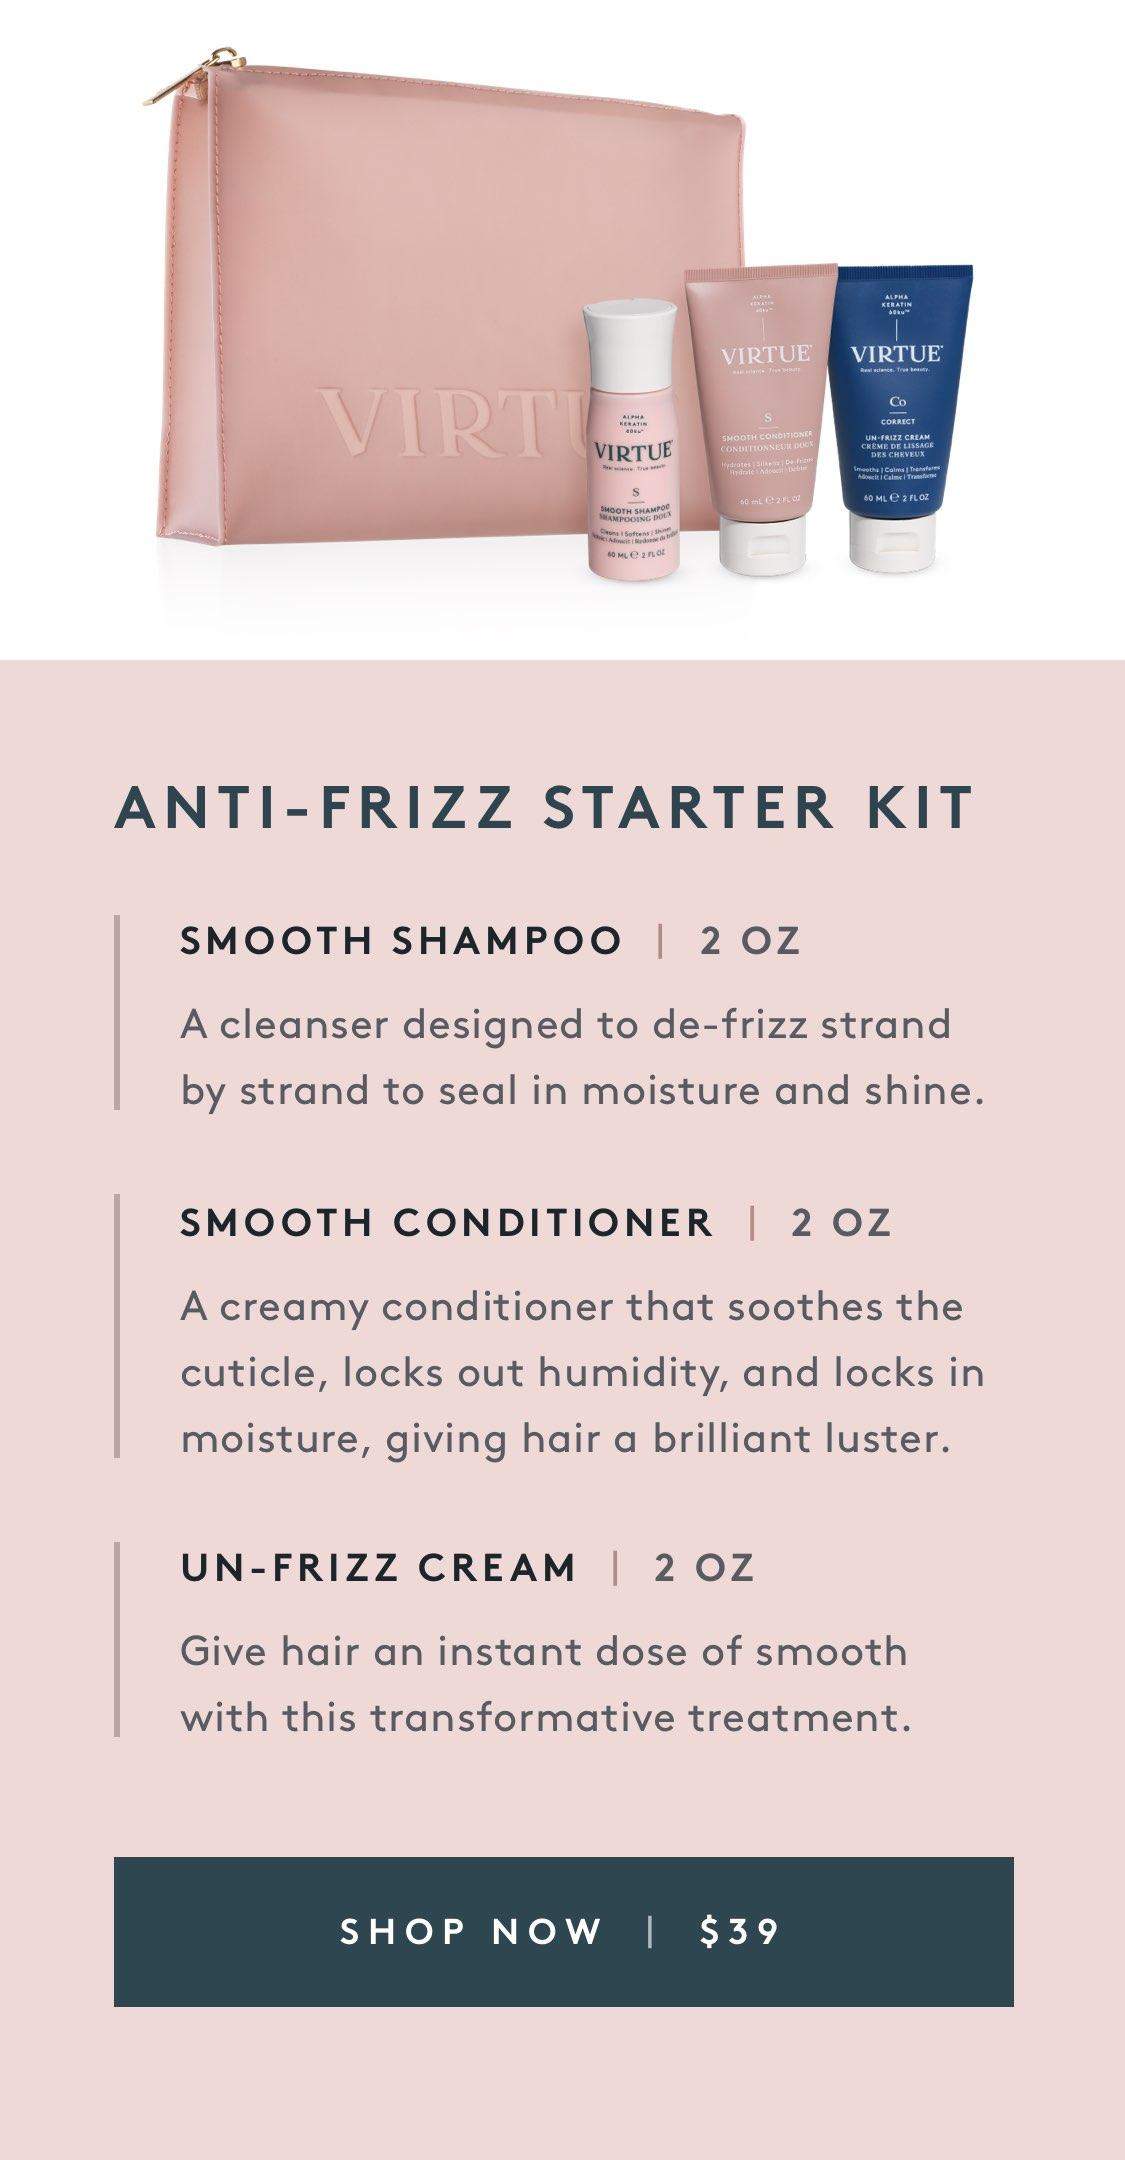 Anti-Frizz Starter Kit